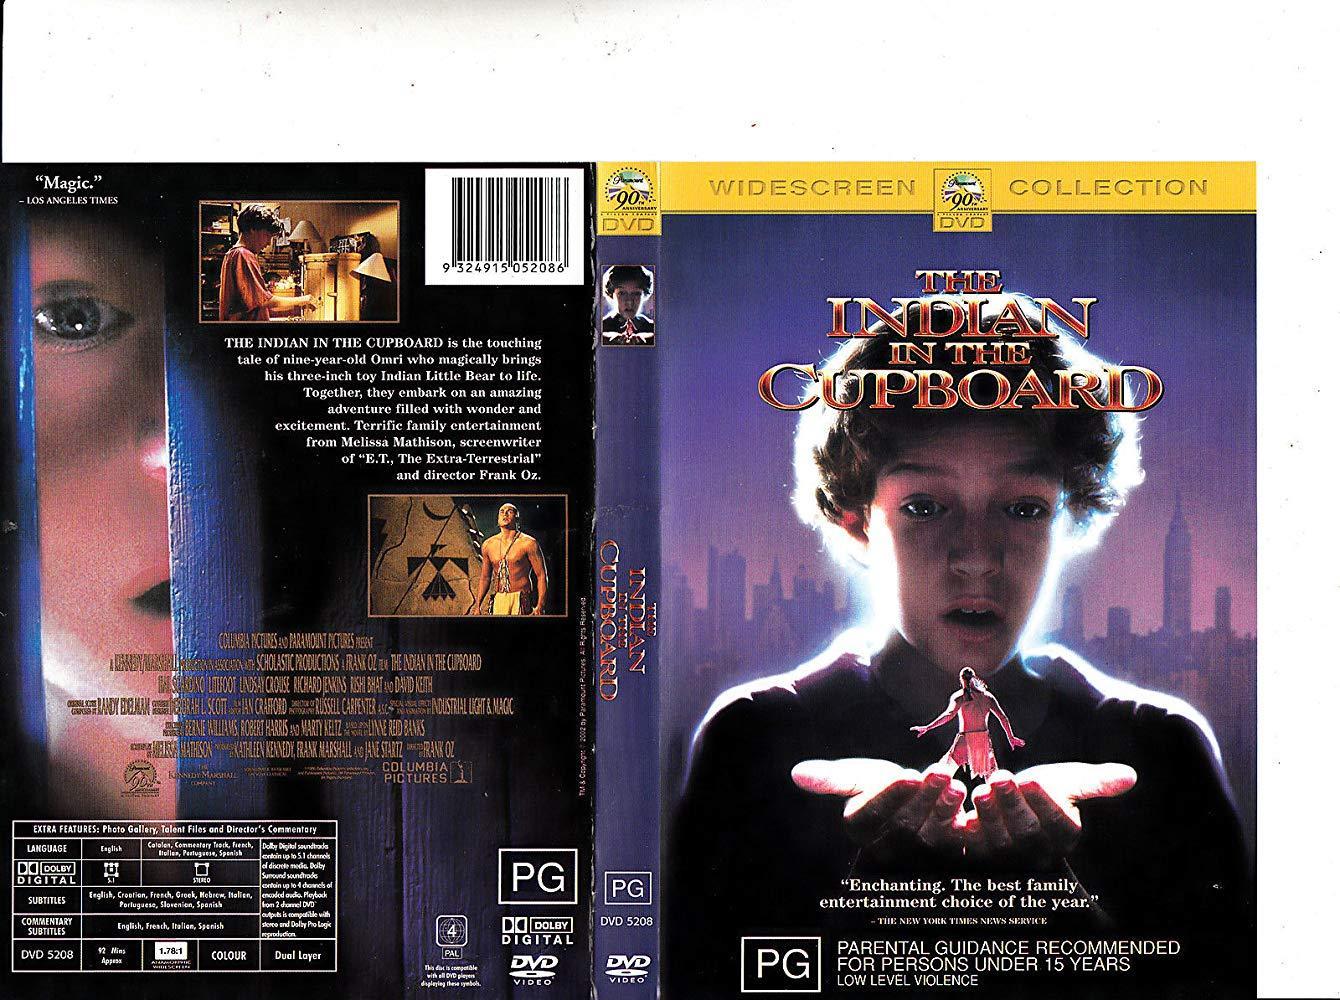 مشاهدة فيلم The Indian in the Cupboard 1995 HD مترجم كامل اون لاين